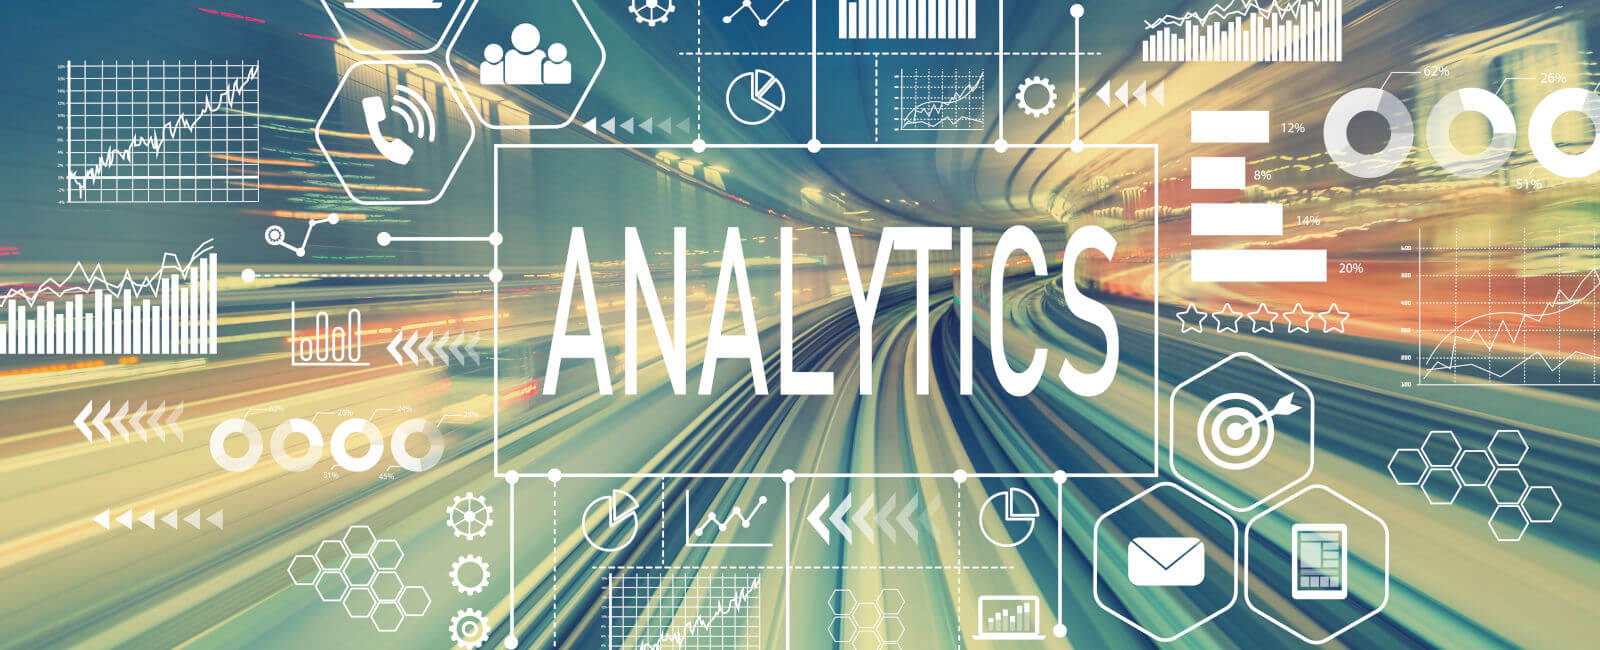 model-based-predictive-analytics